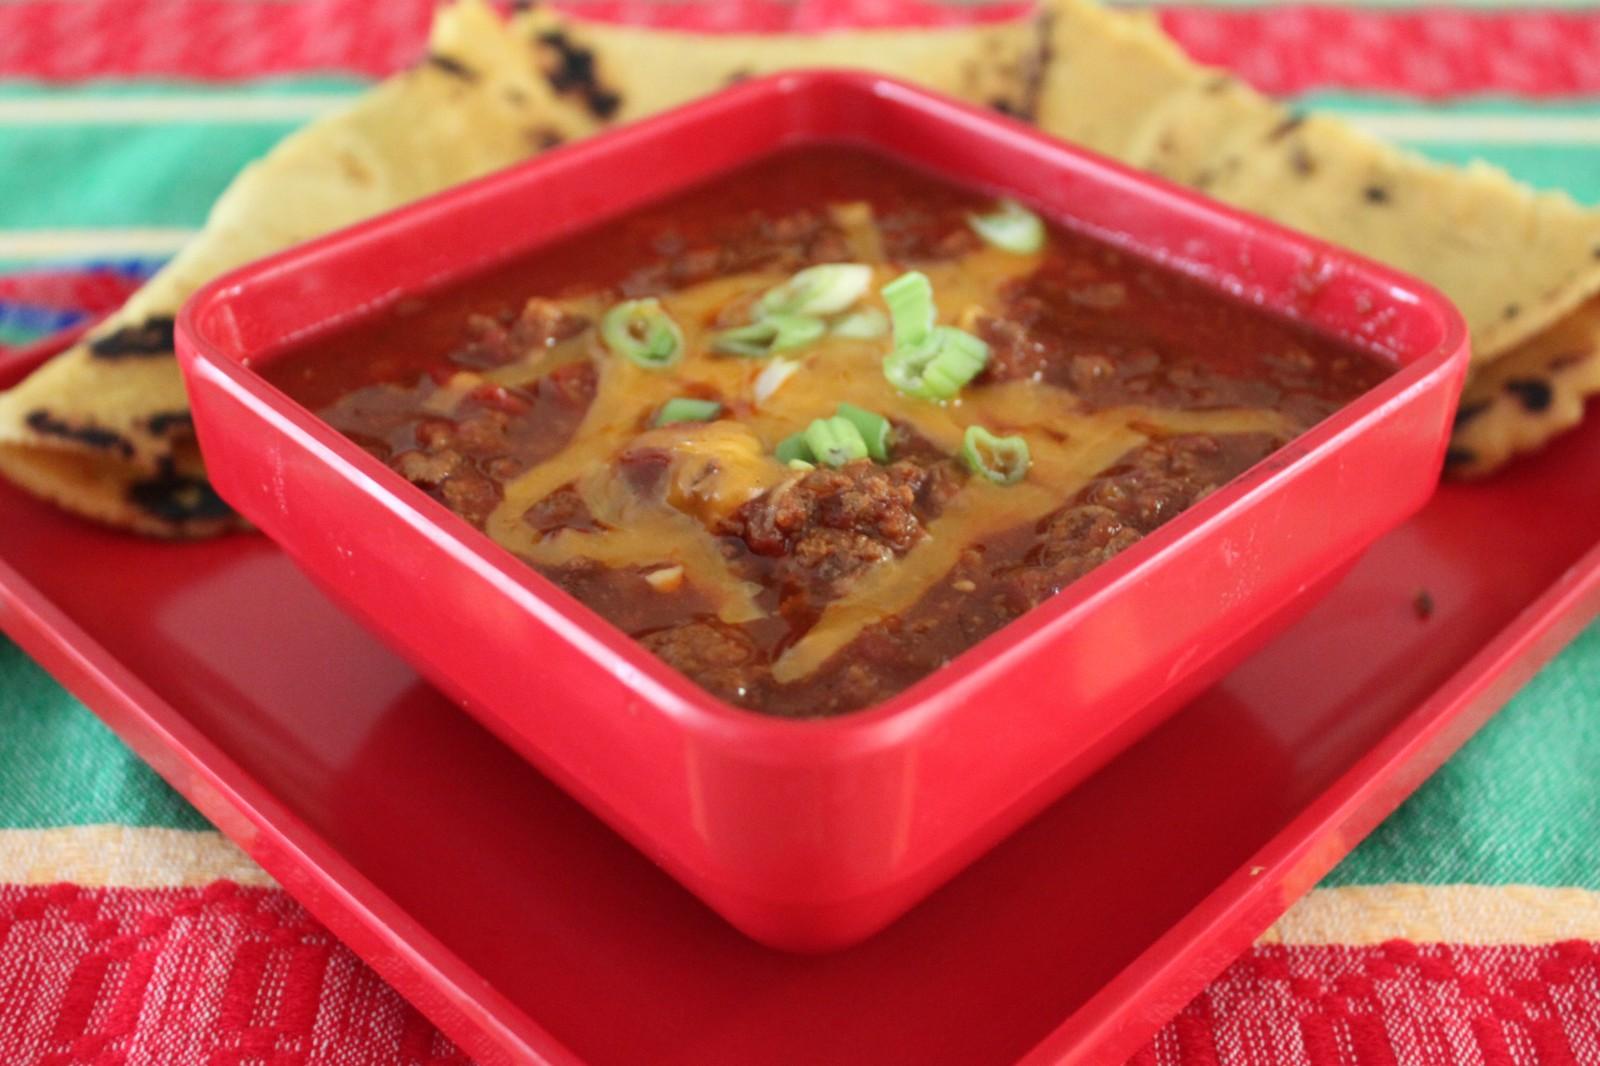 Texas Easy Slow-Cook Chili